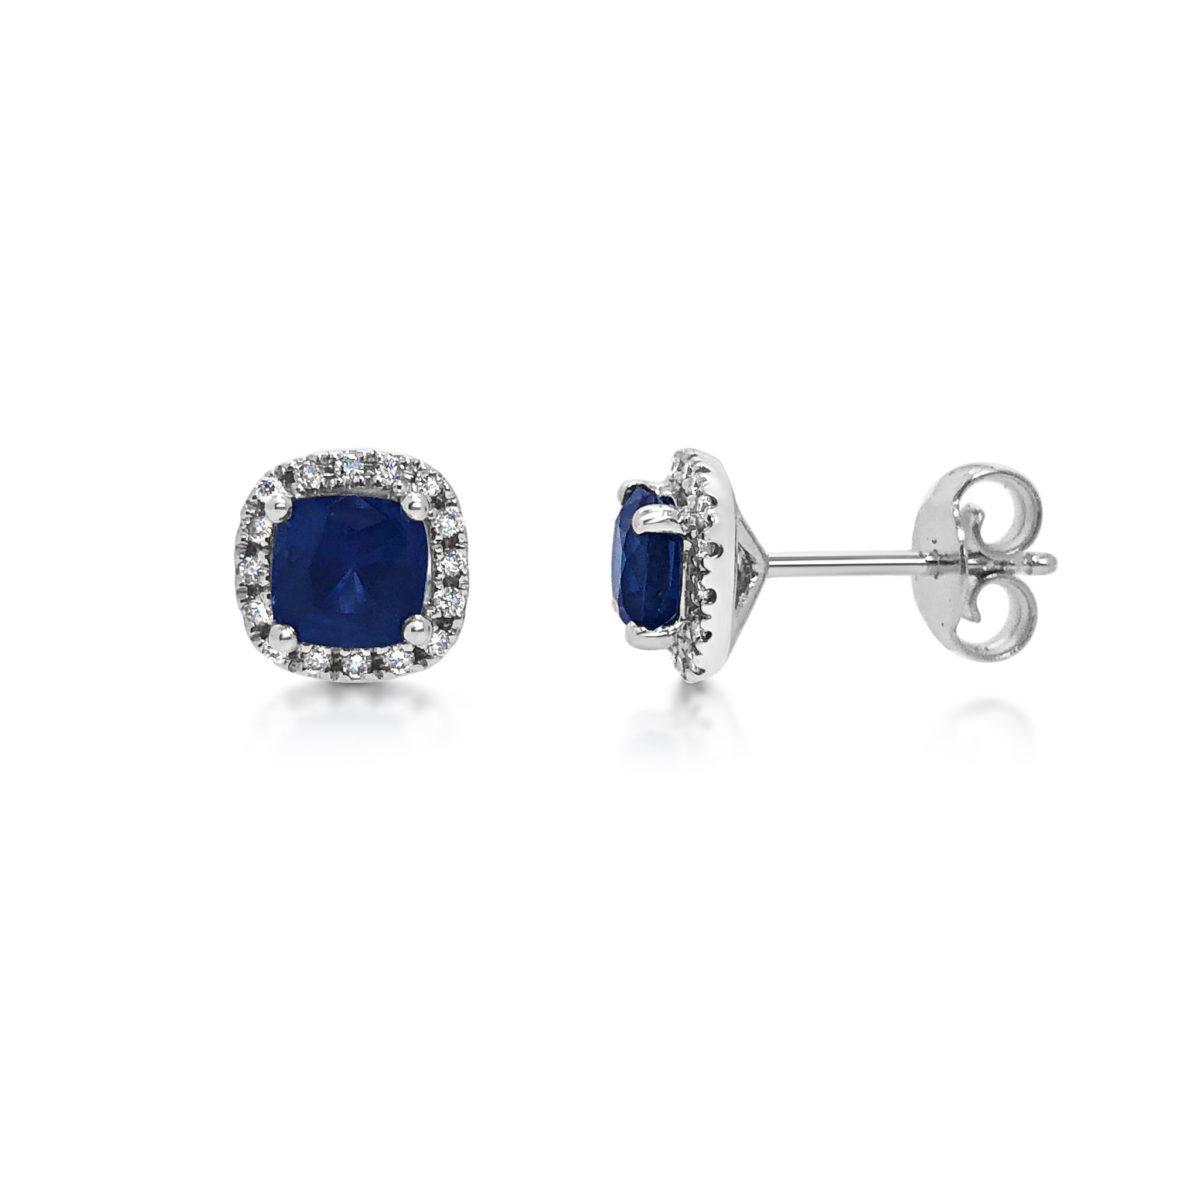 Sade Cushion Cut Blue Sapphire Diamond Halo Earrings